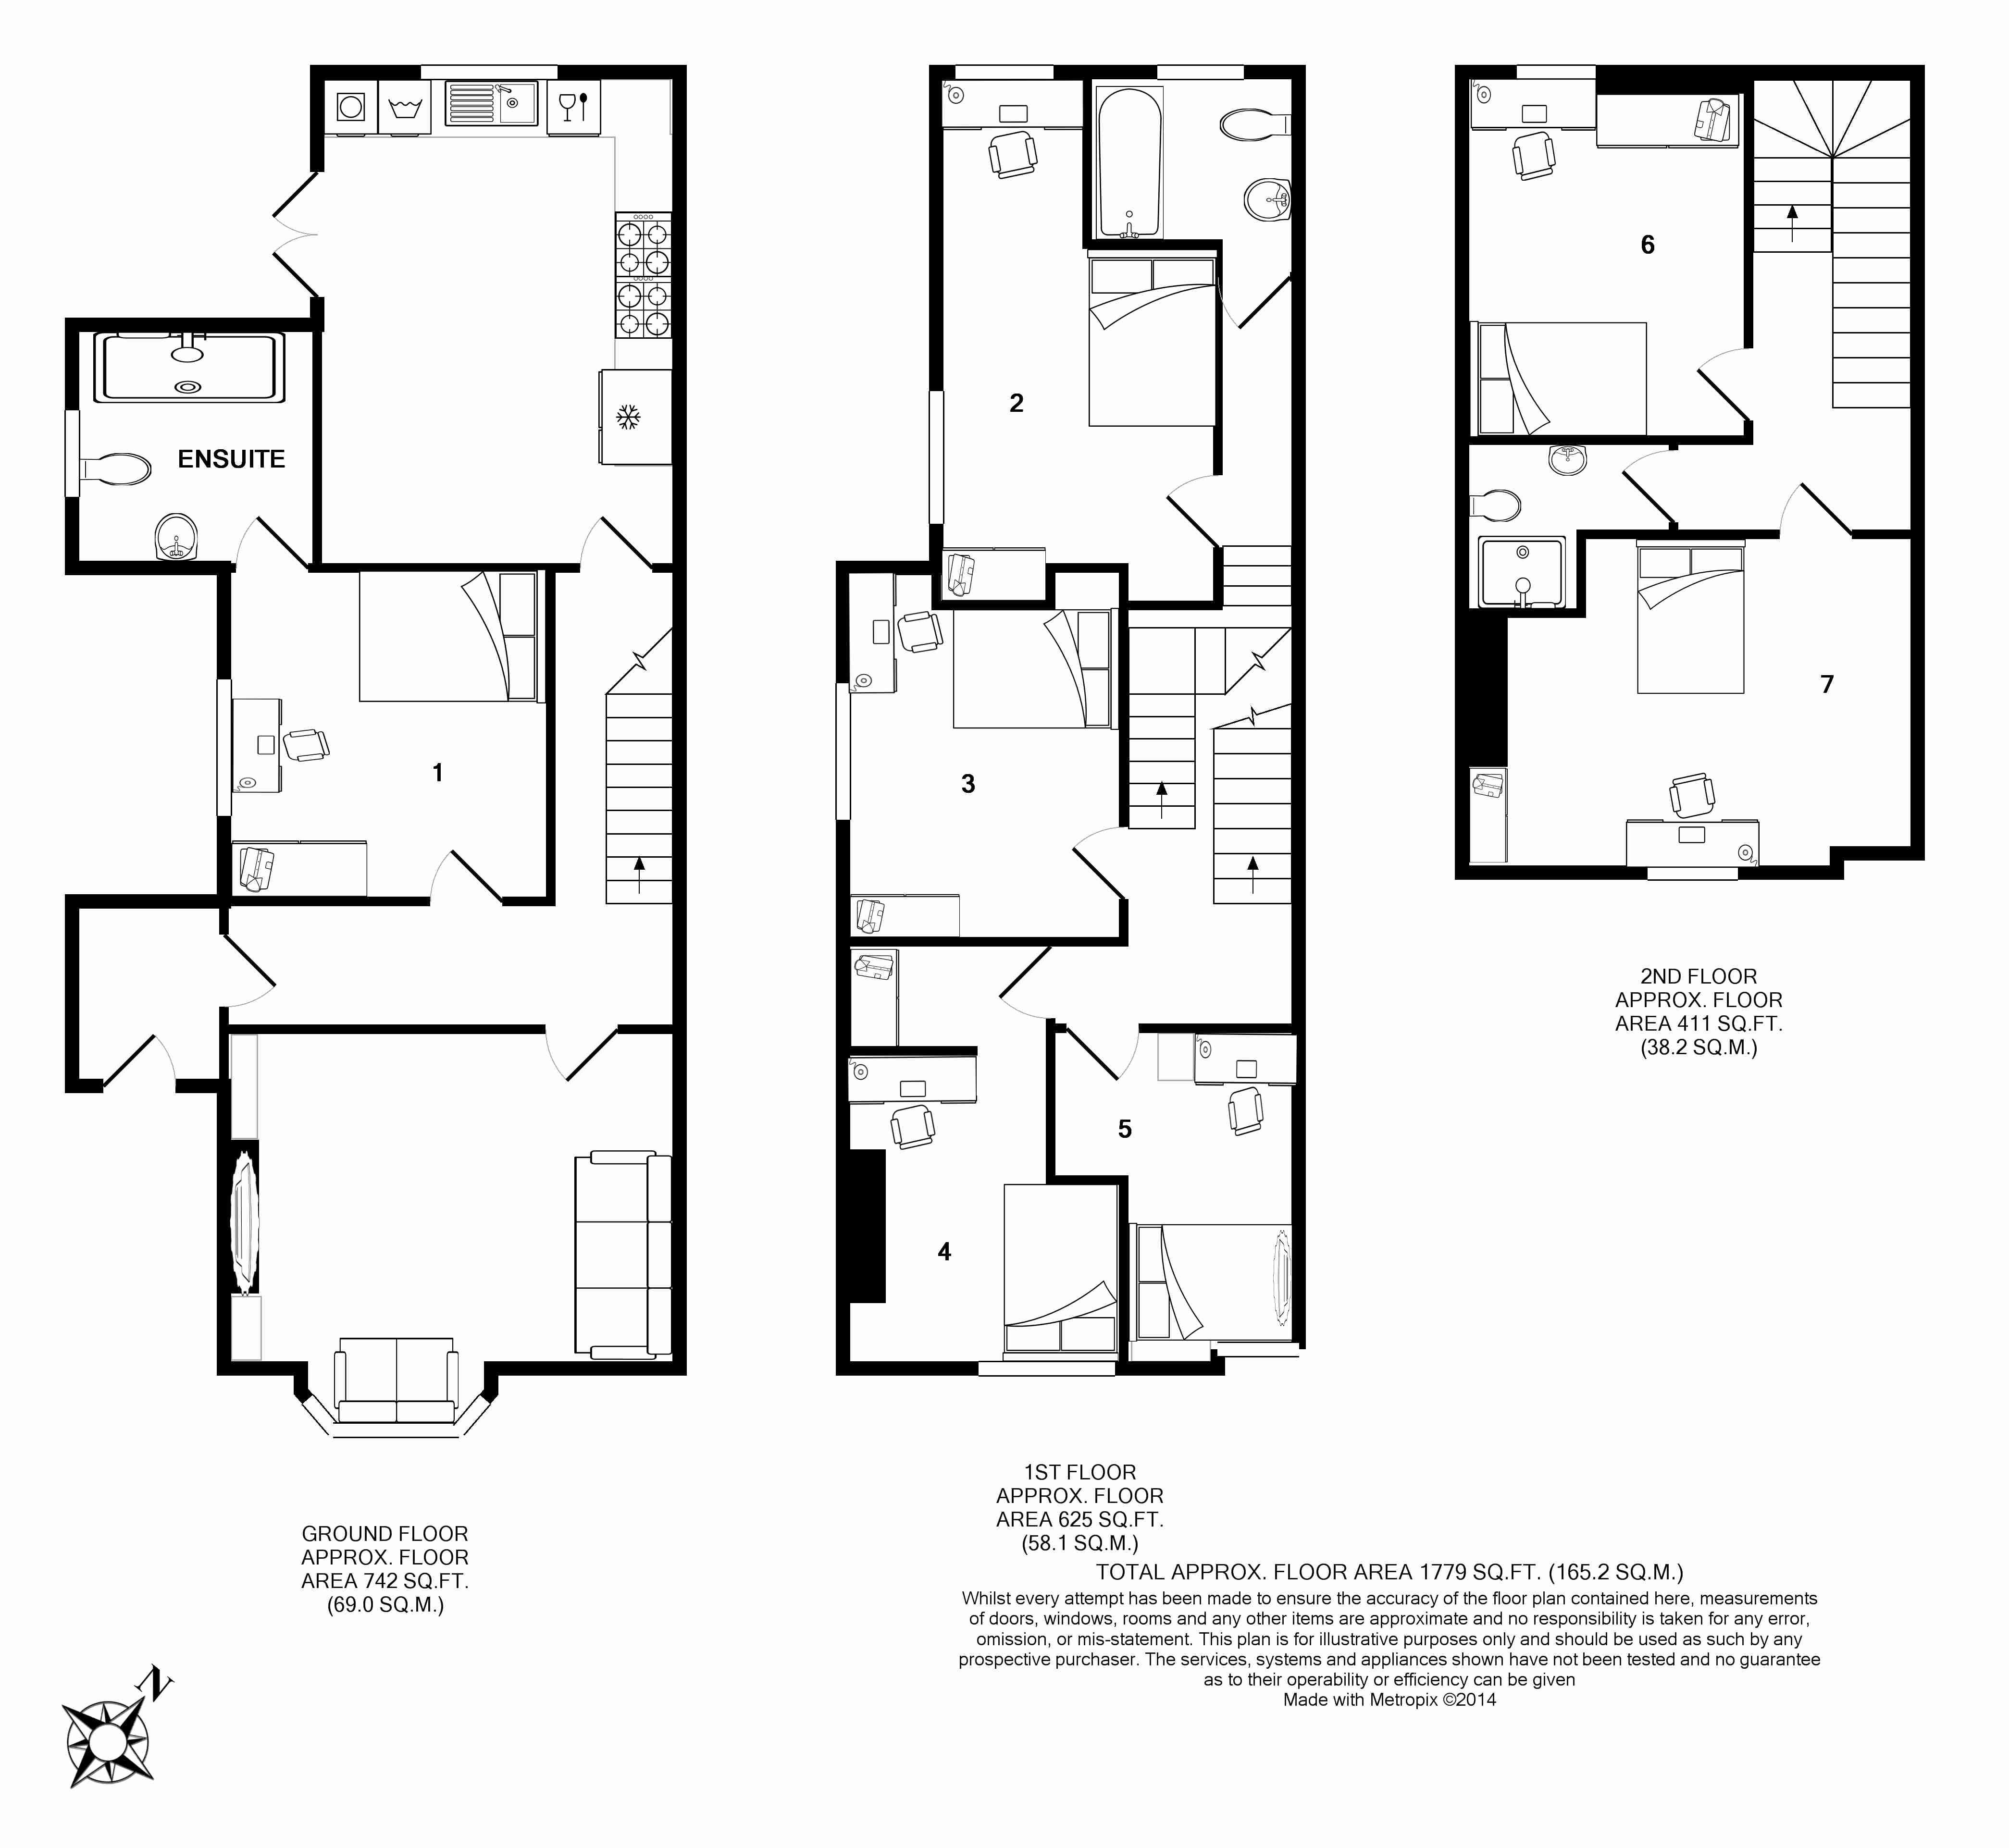 29 Bagot Street Floorplans